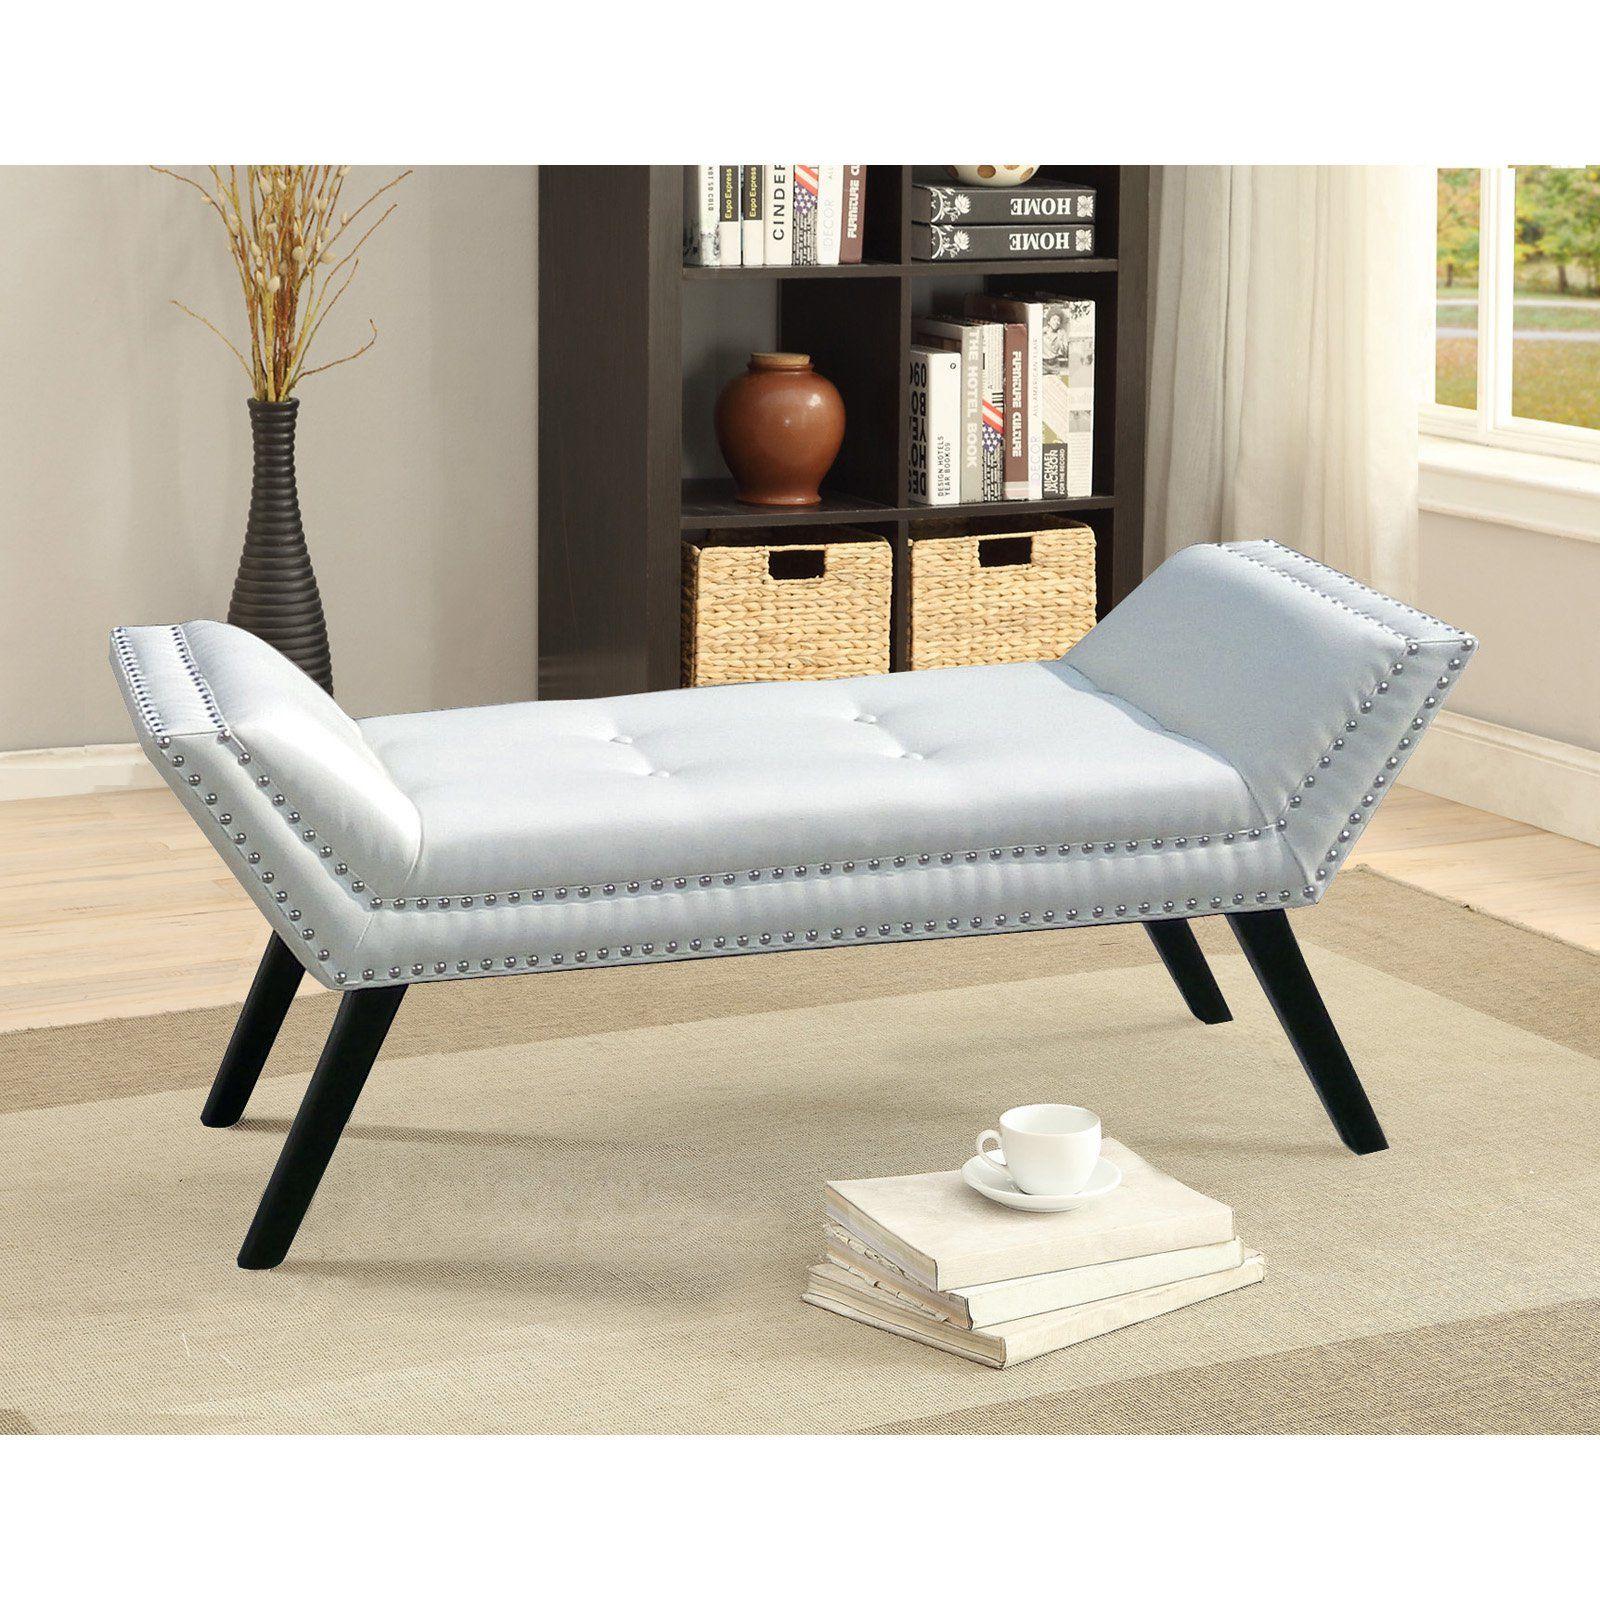 Fantastic Baxton Studio Tamblin Bedroom Bench Products In 2019 Short Links Chair Design For Home Short Linksinfo